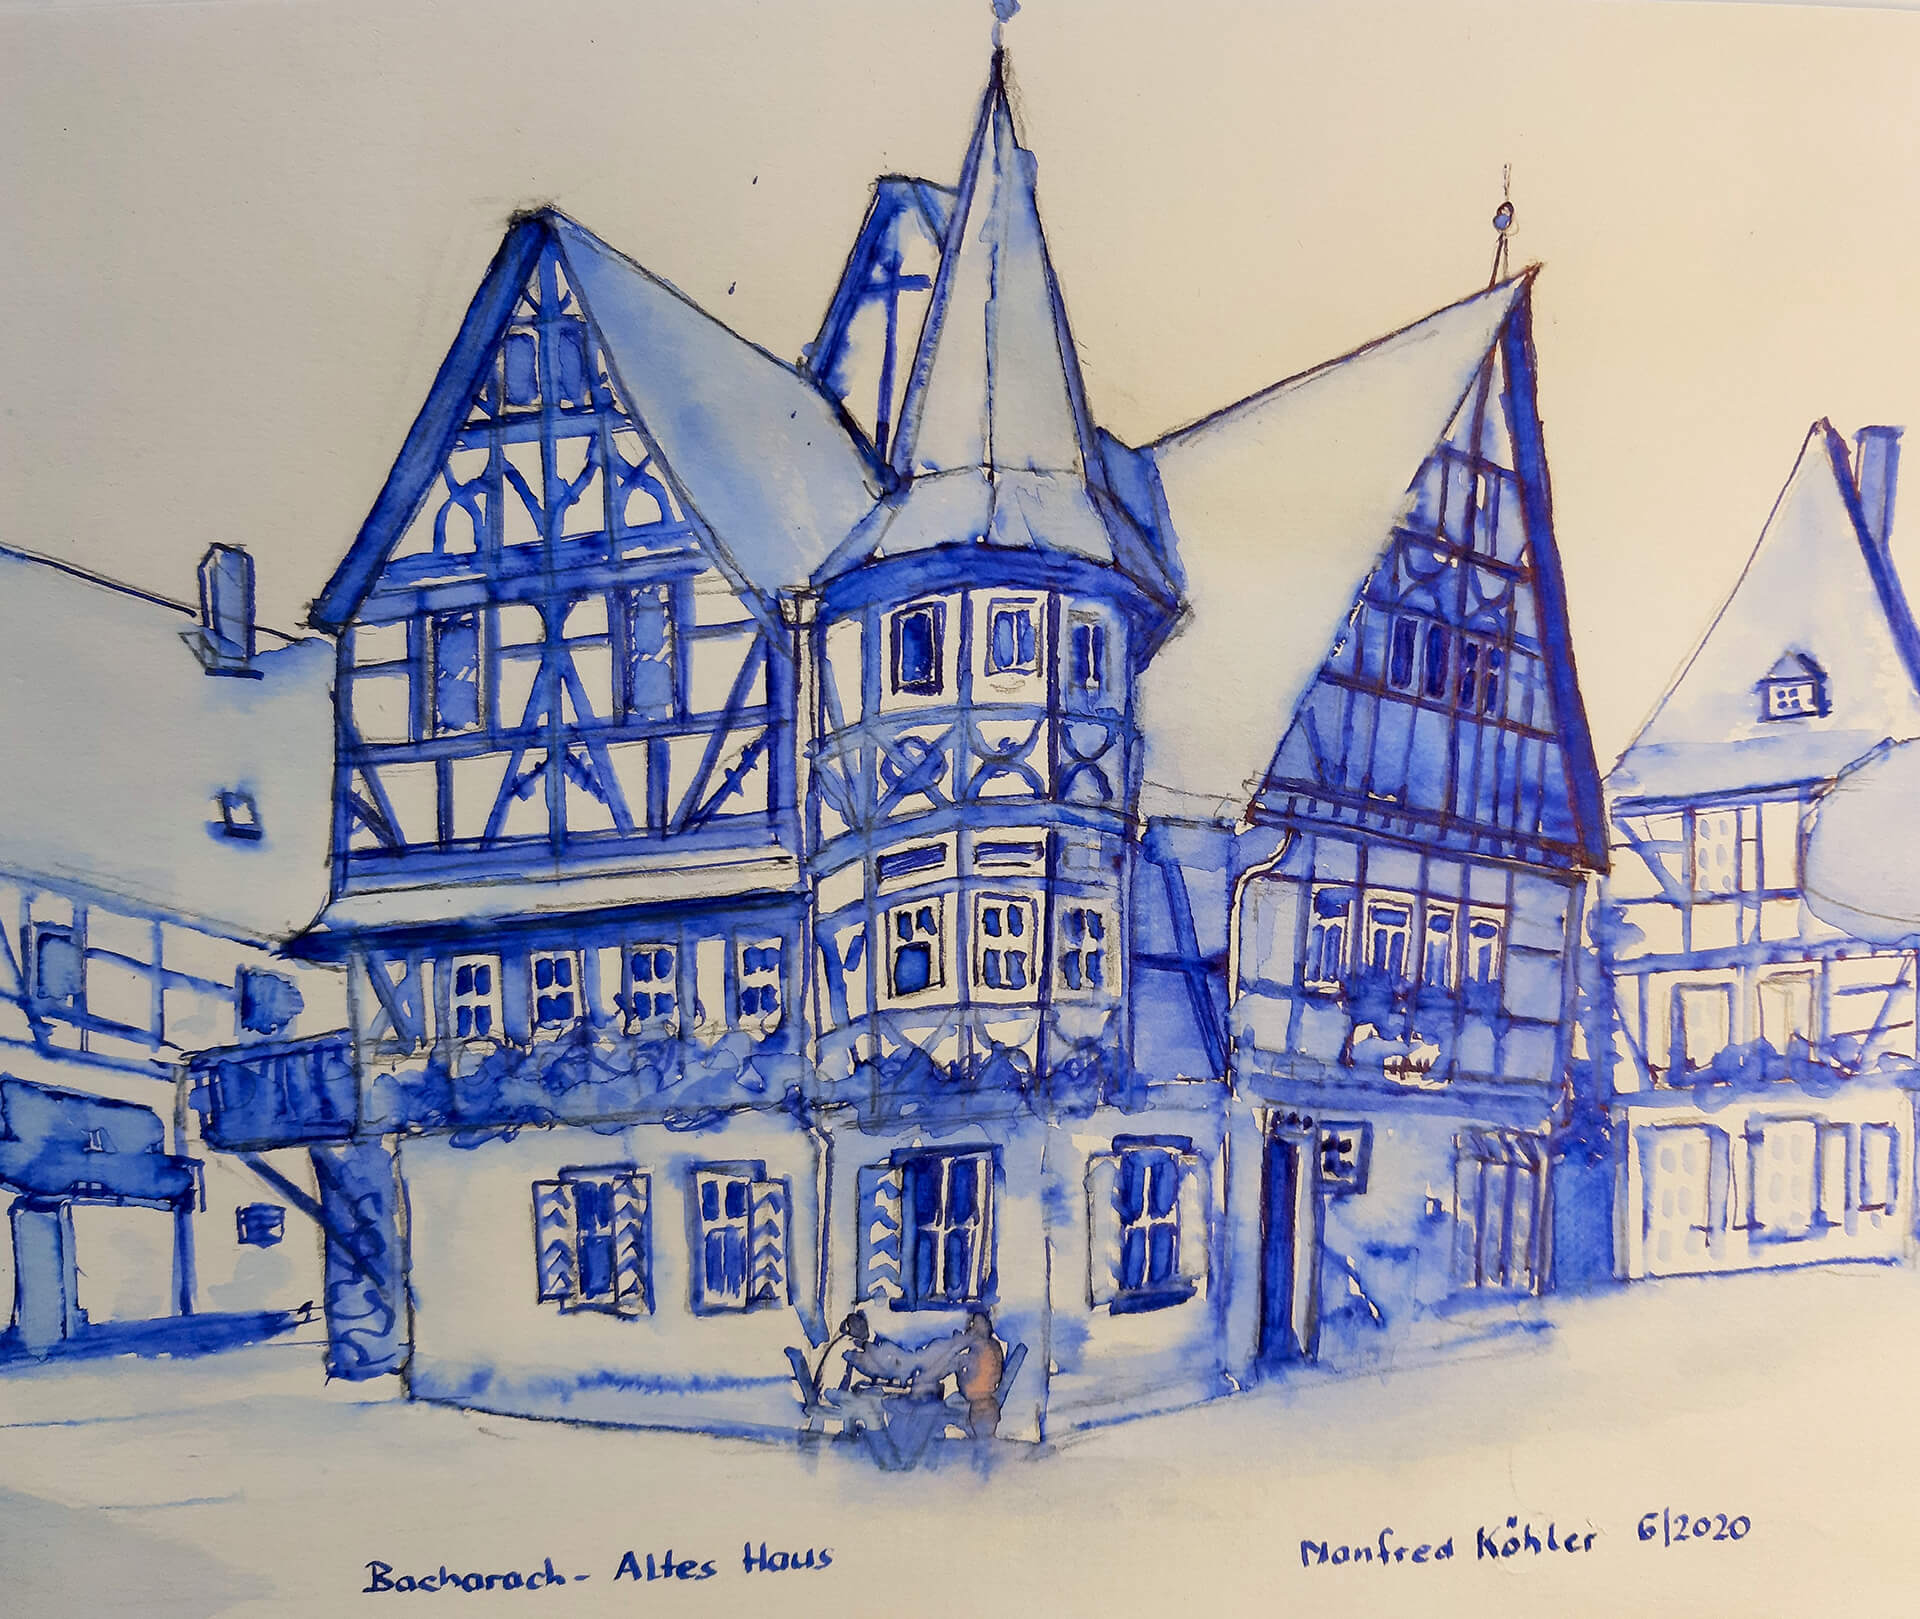 Koehler-Manfred-Bacharach-Altes-Haus-USK-06.2020